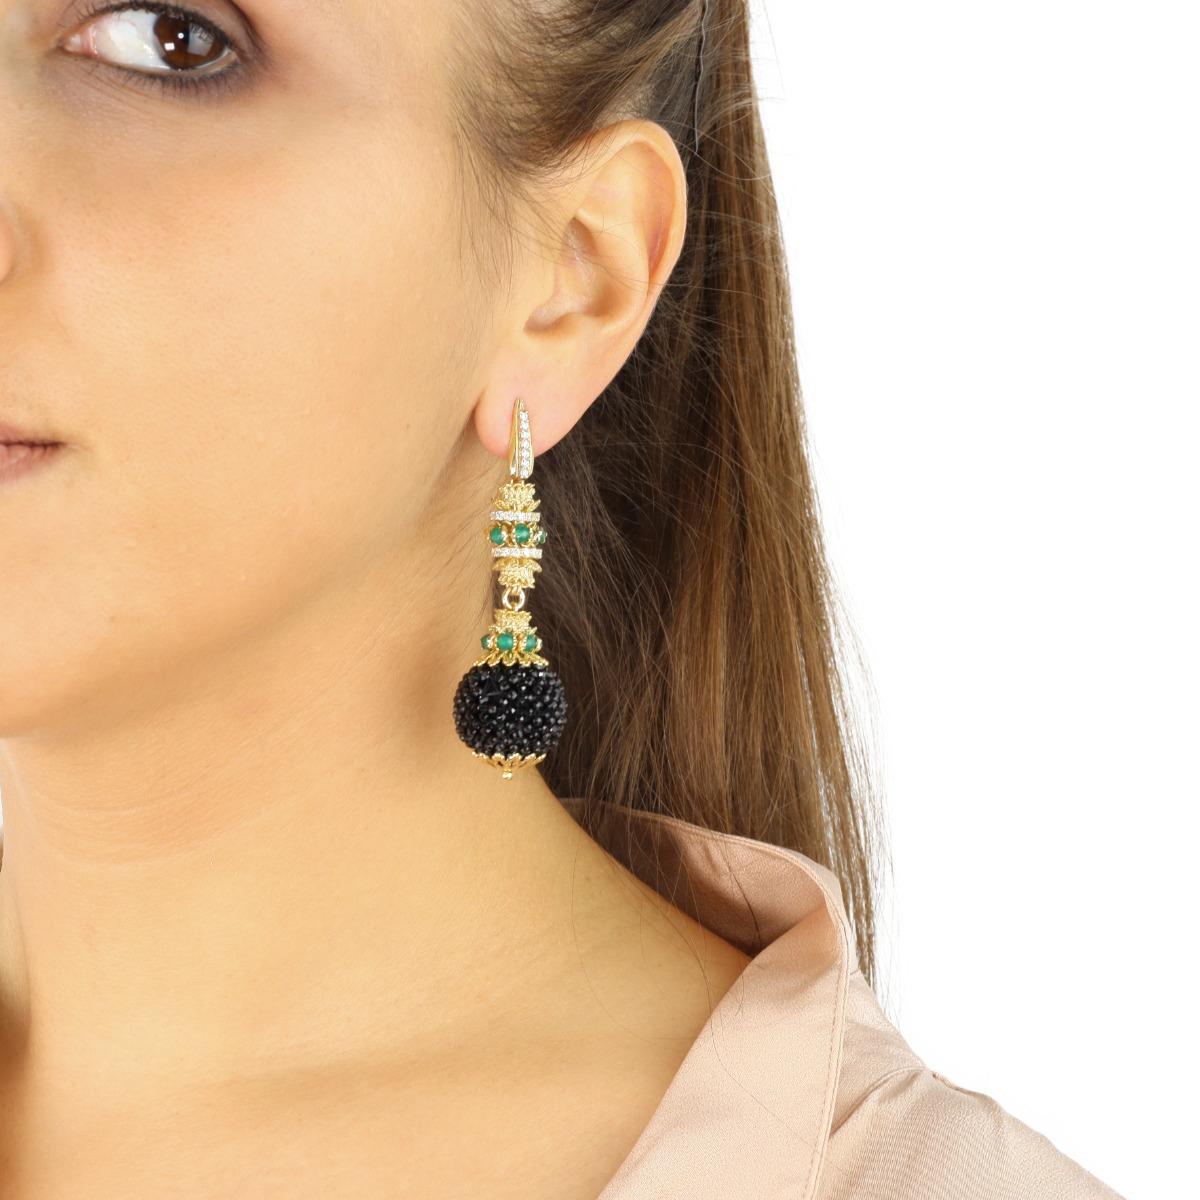 Jade And Onyxes Baroque Earrings